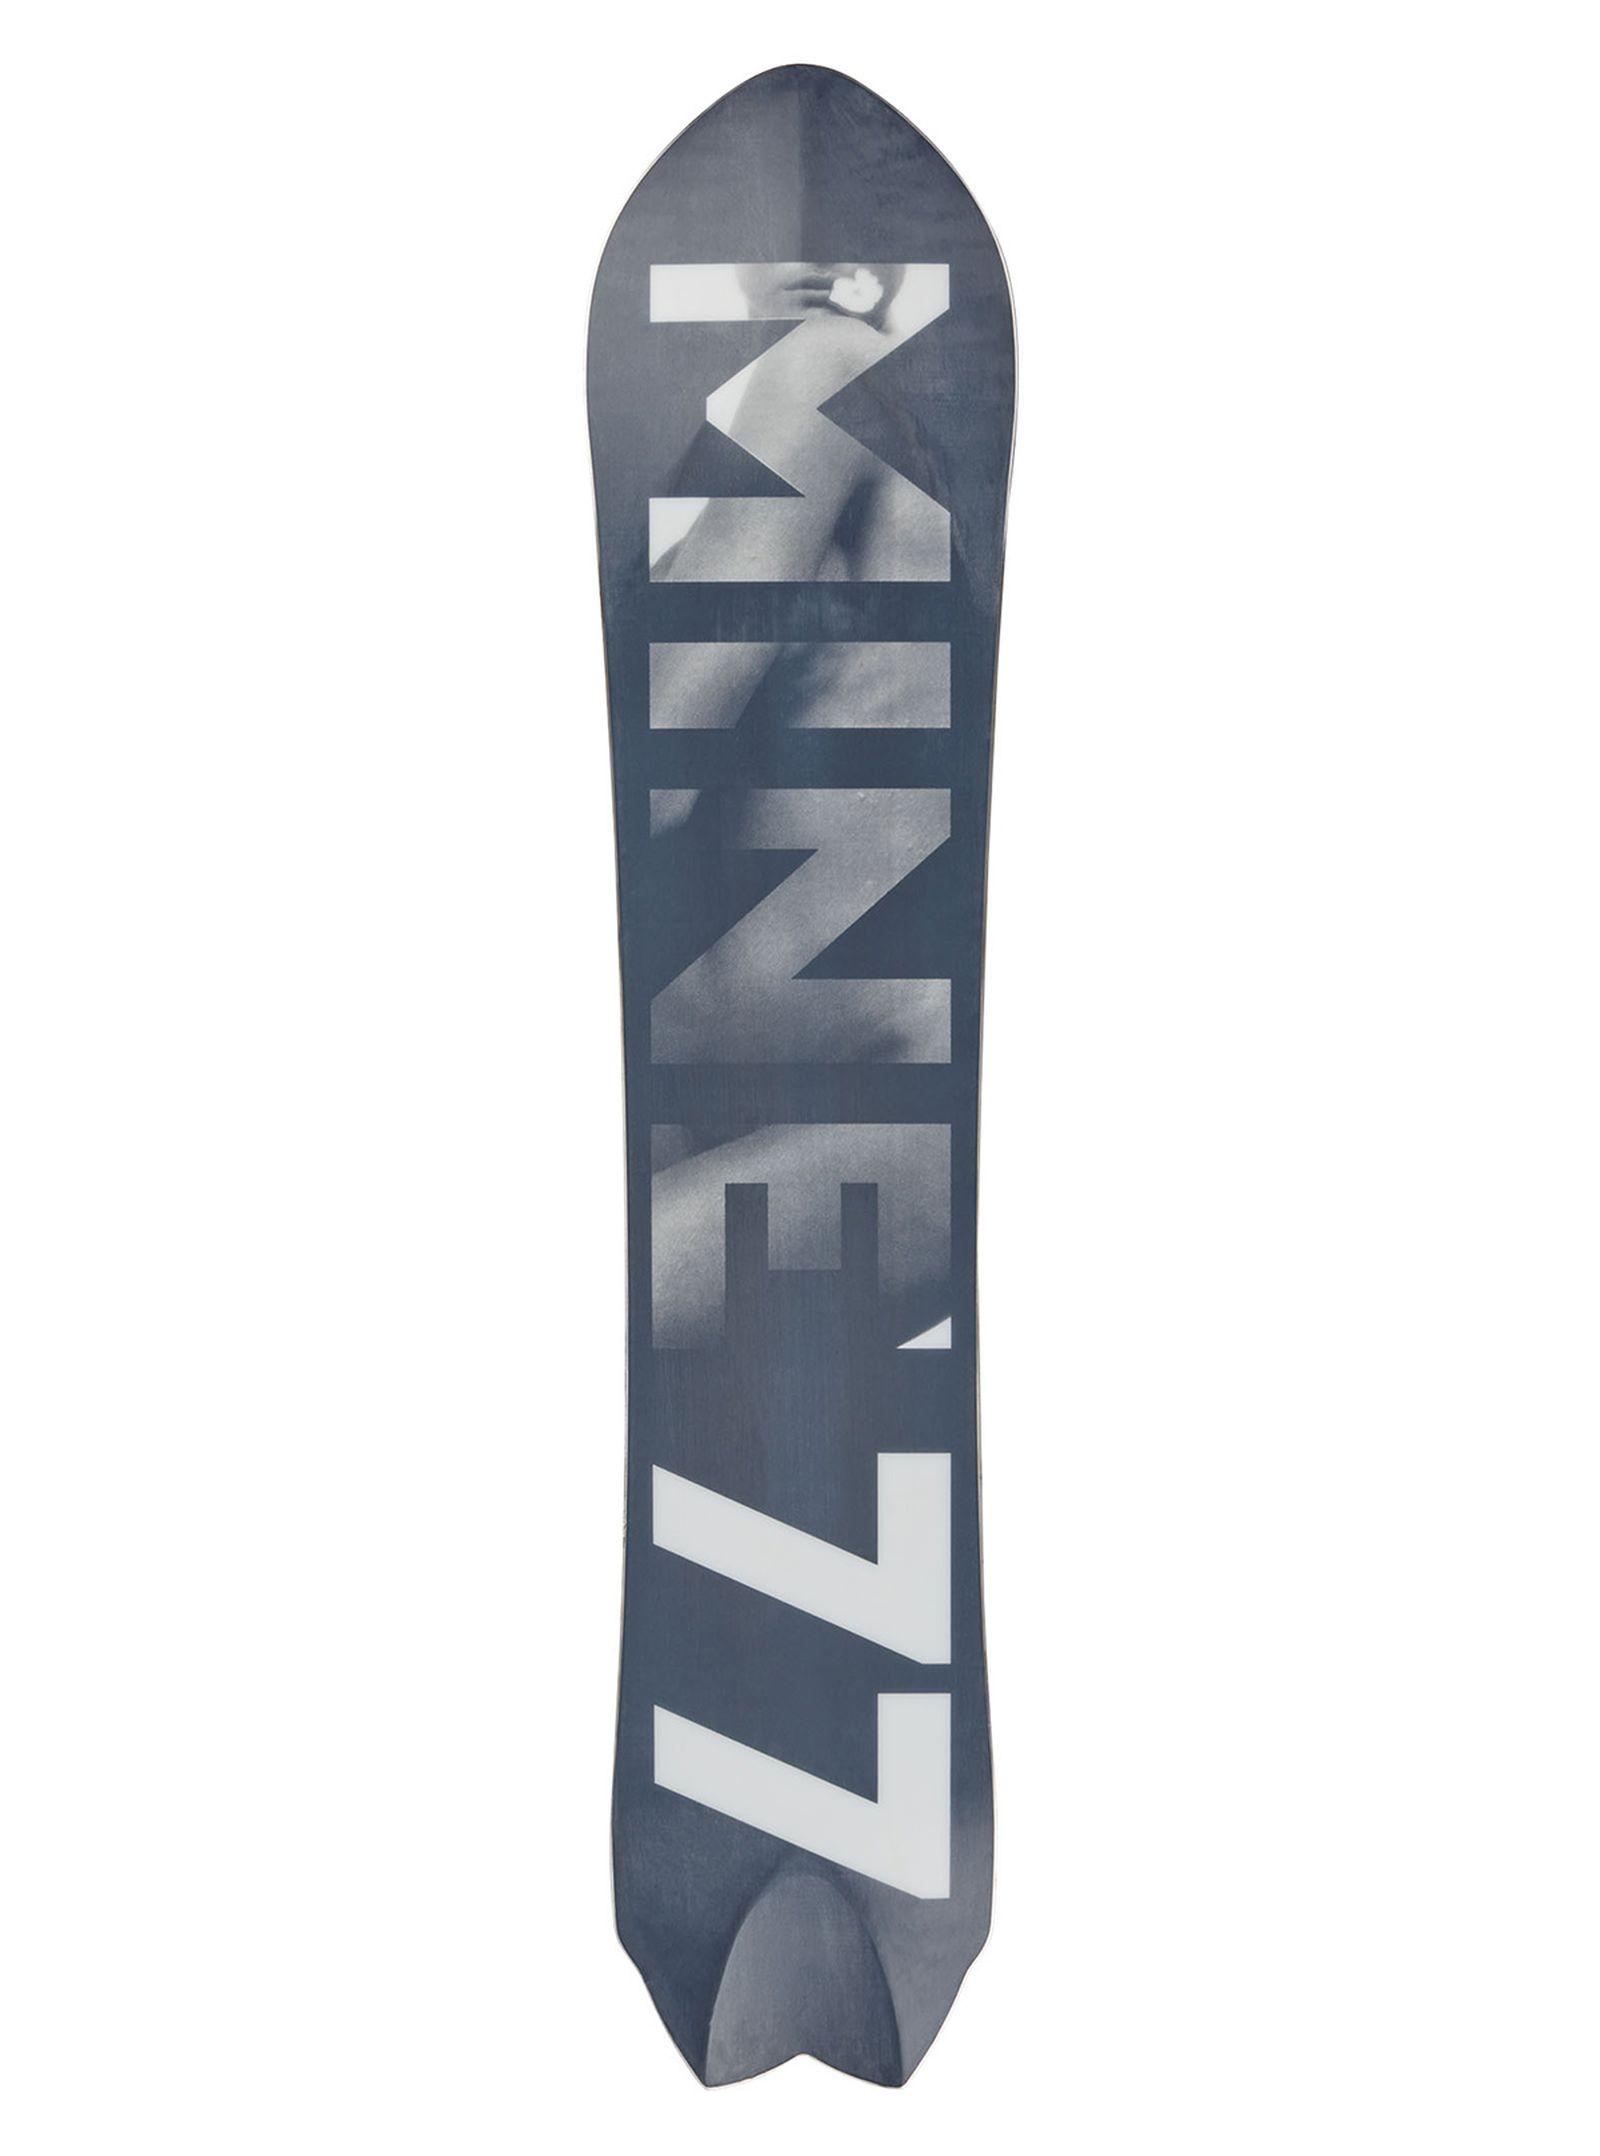 burton-mine77-deep-winter-2020-01